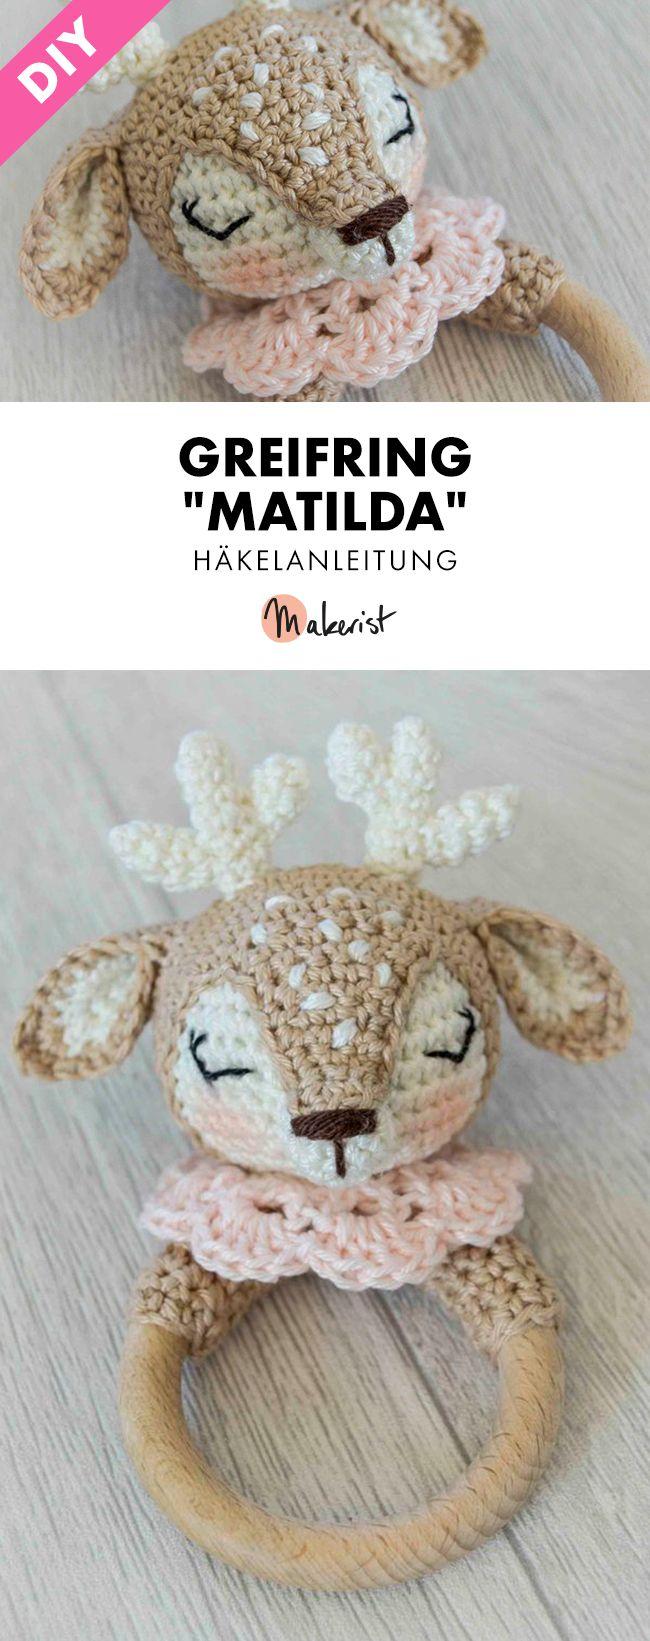 Photo of Greifring Rentier Matilda häkeln – Häkelanleitung via Makerist.de #häkeln #h…